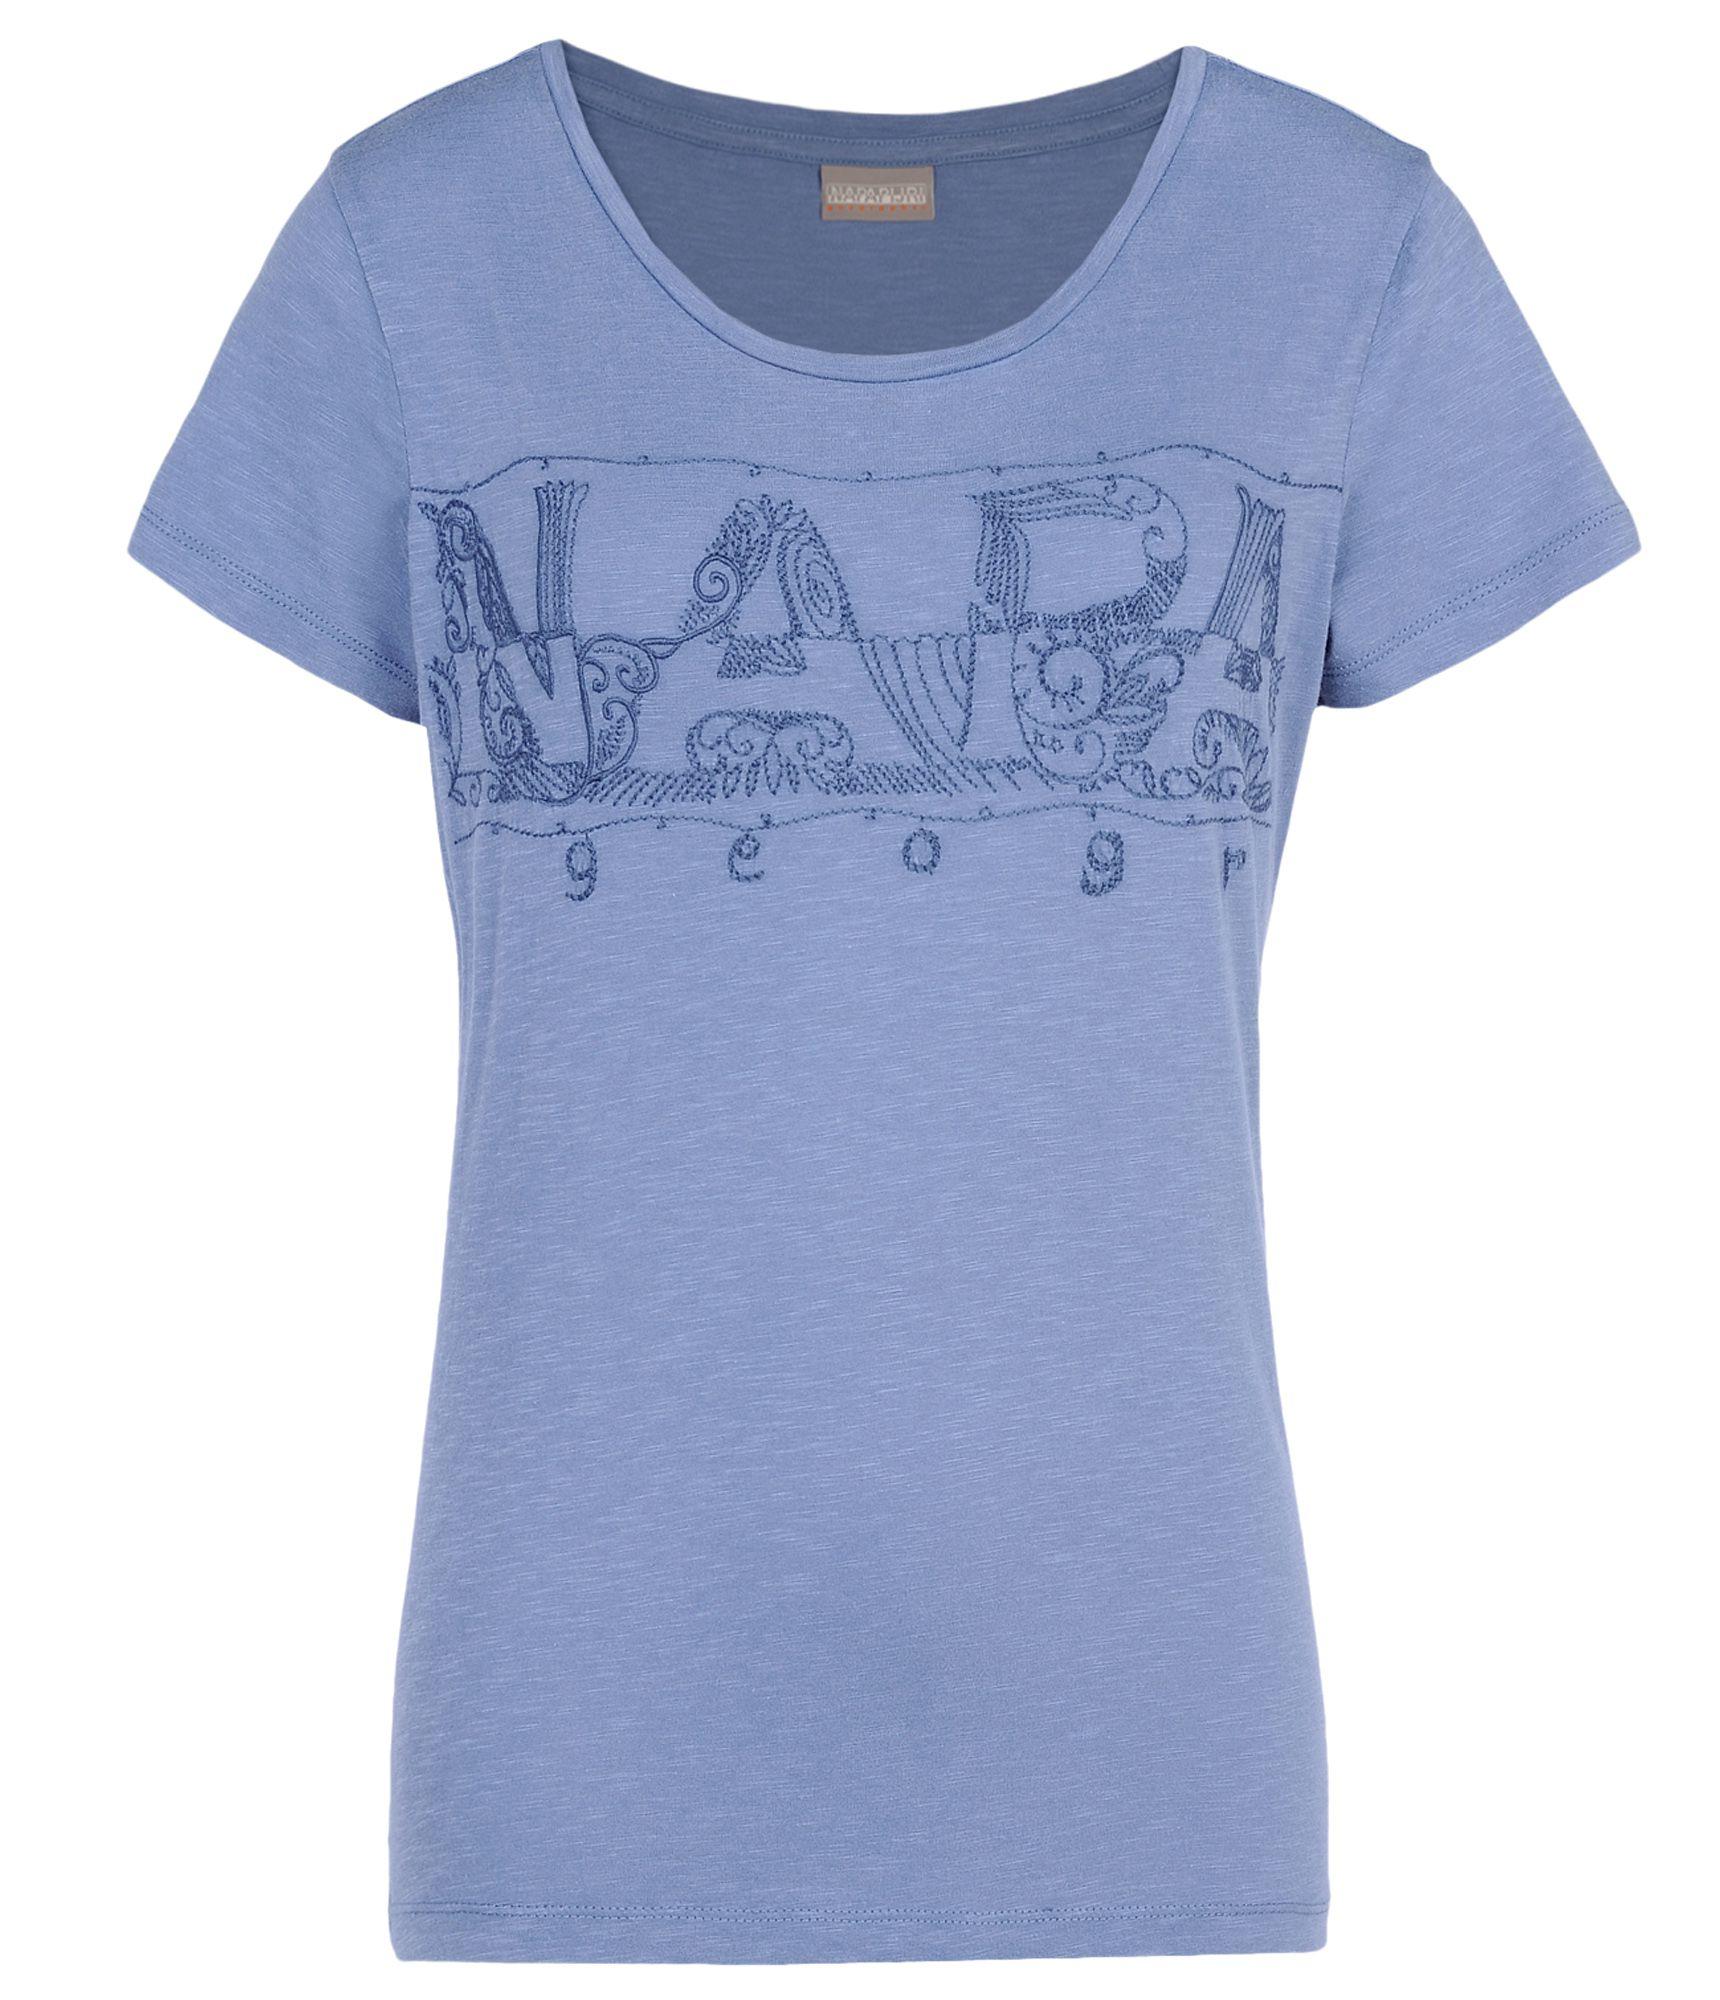 lyst napapijri short sleeve t shirt in blue. Black Bedroom Furniture Sets. Home Design Ideas